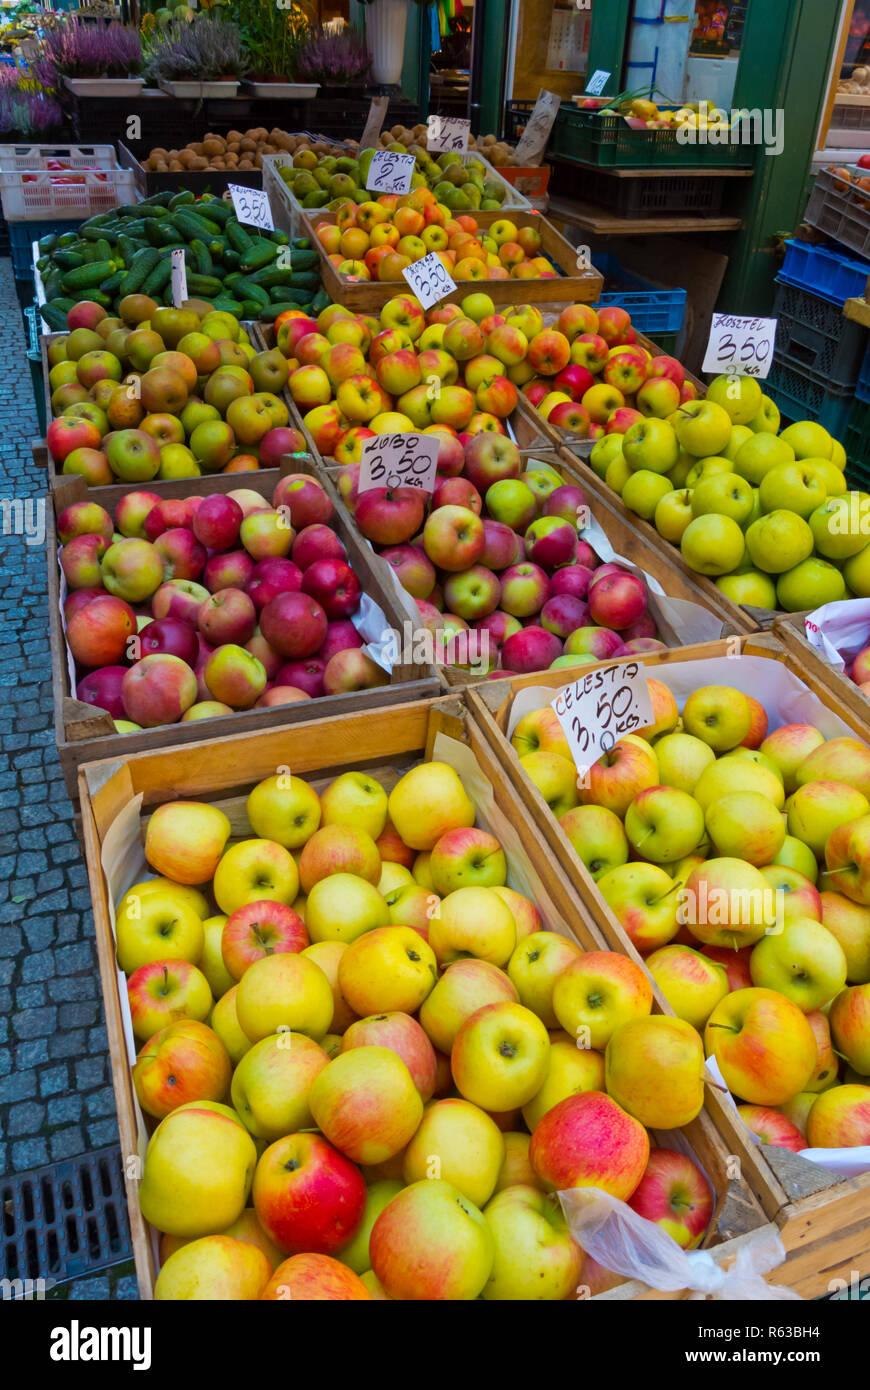 Apples, main outdoor market, outside Hala Targowa, Plac Dominikanski, Gdansk, Poland Stock Photo